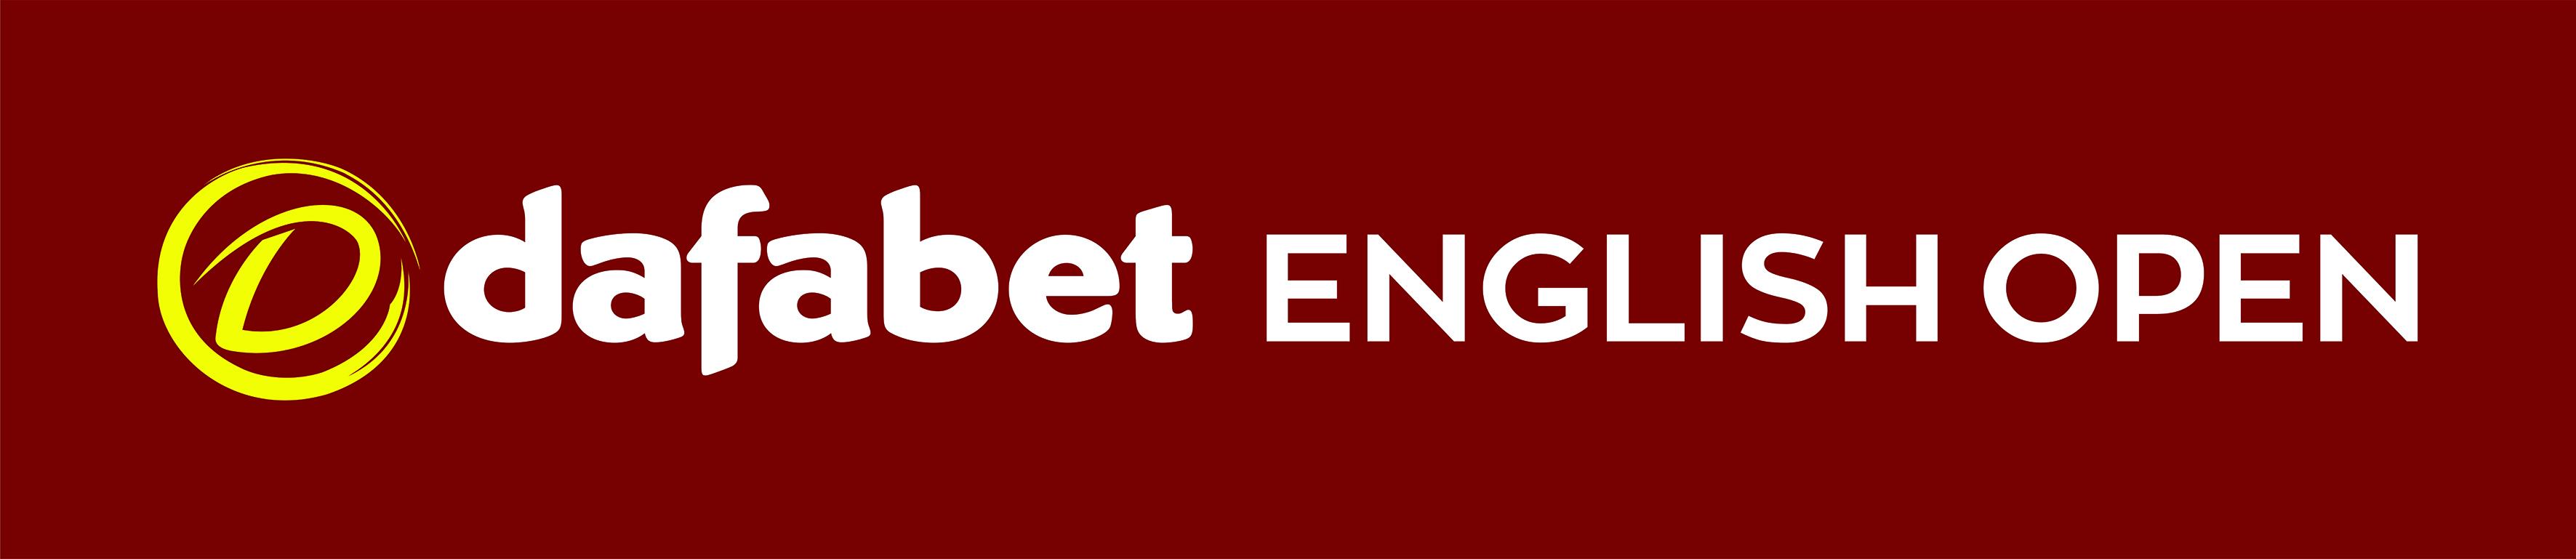 snooker english open